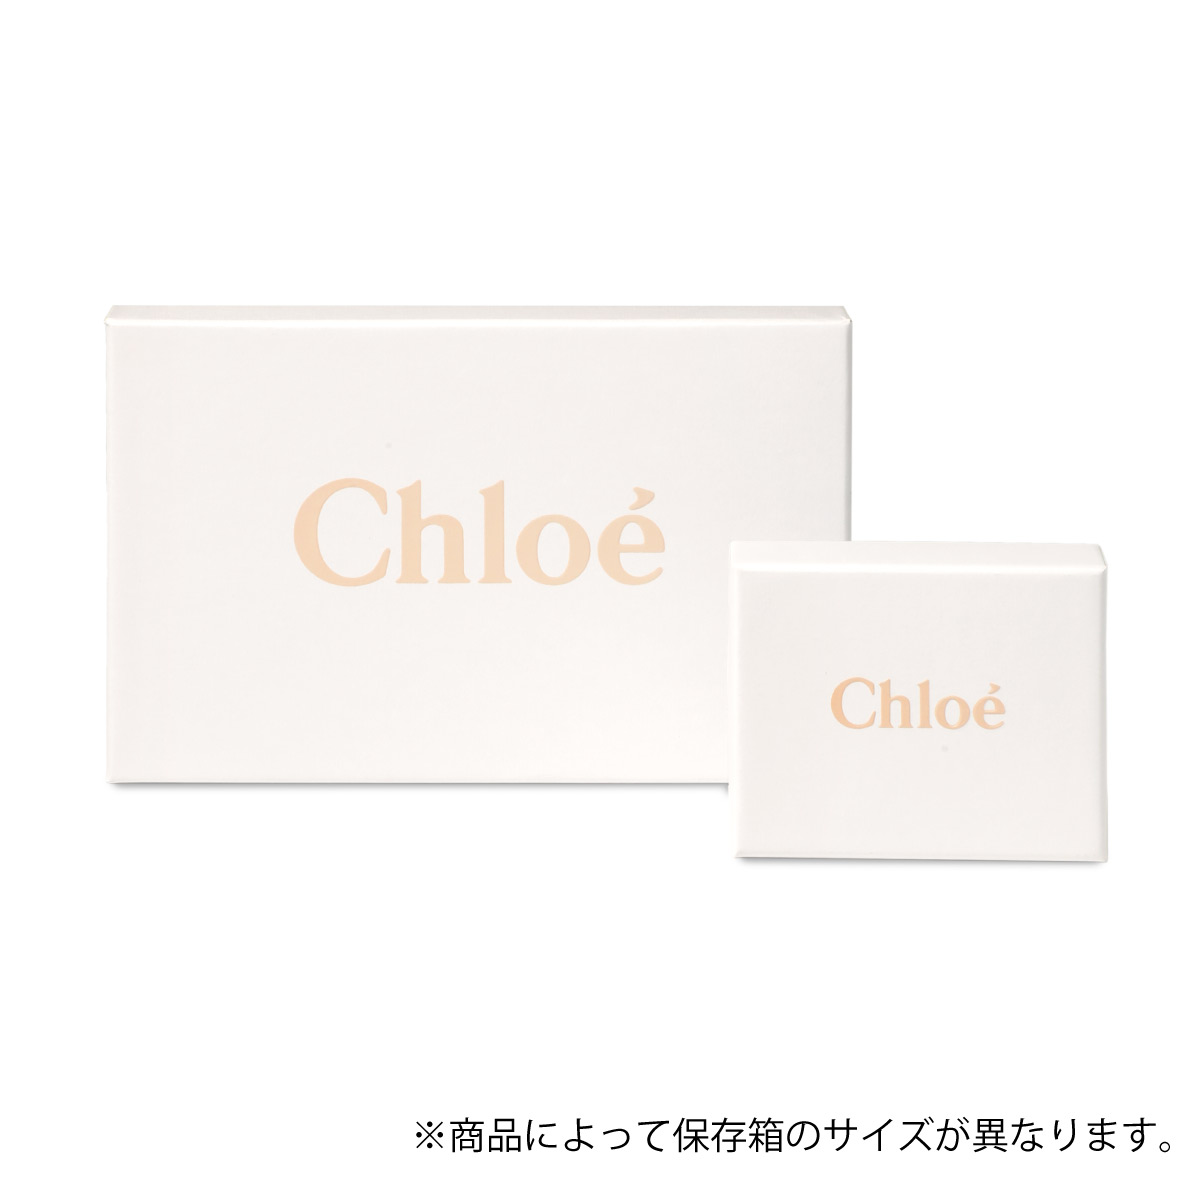 CHLOE クロエ | カードケース | CHLOE C クロエ シー